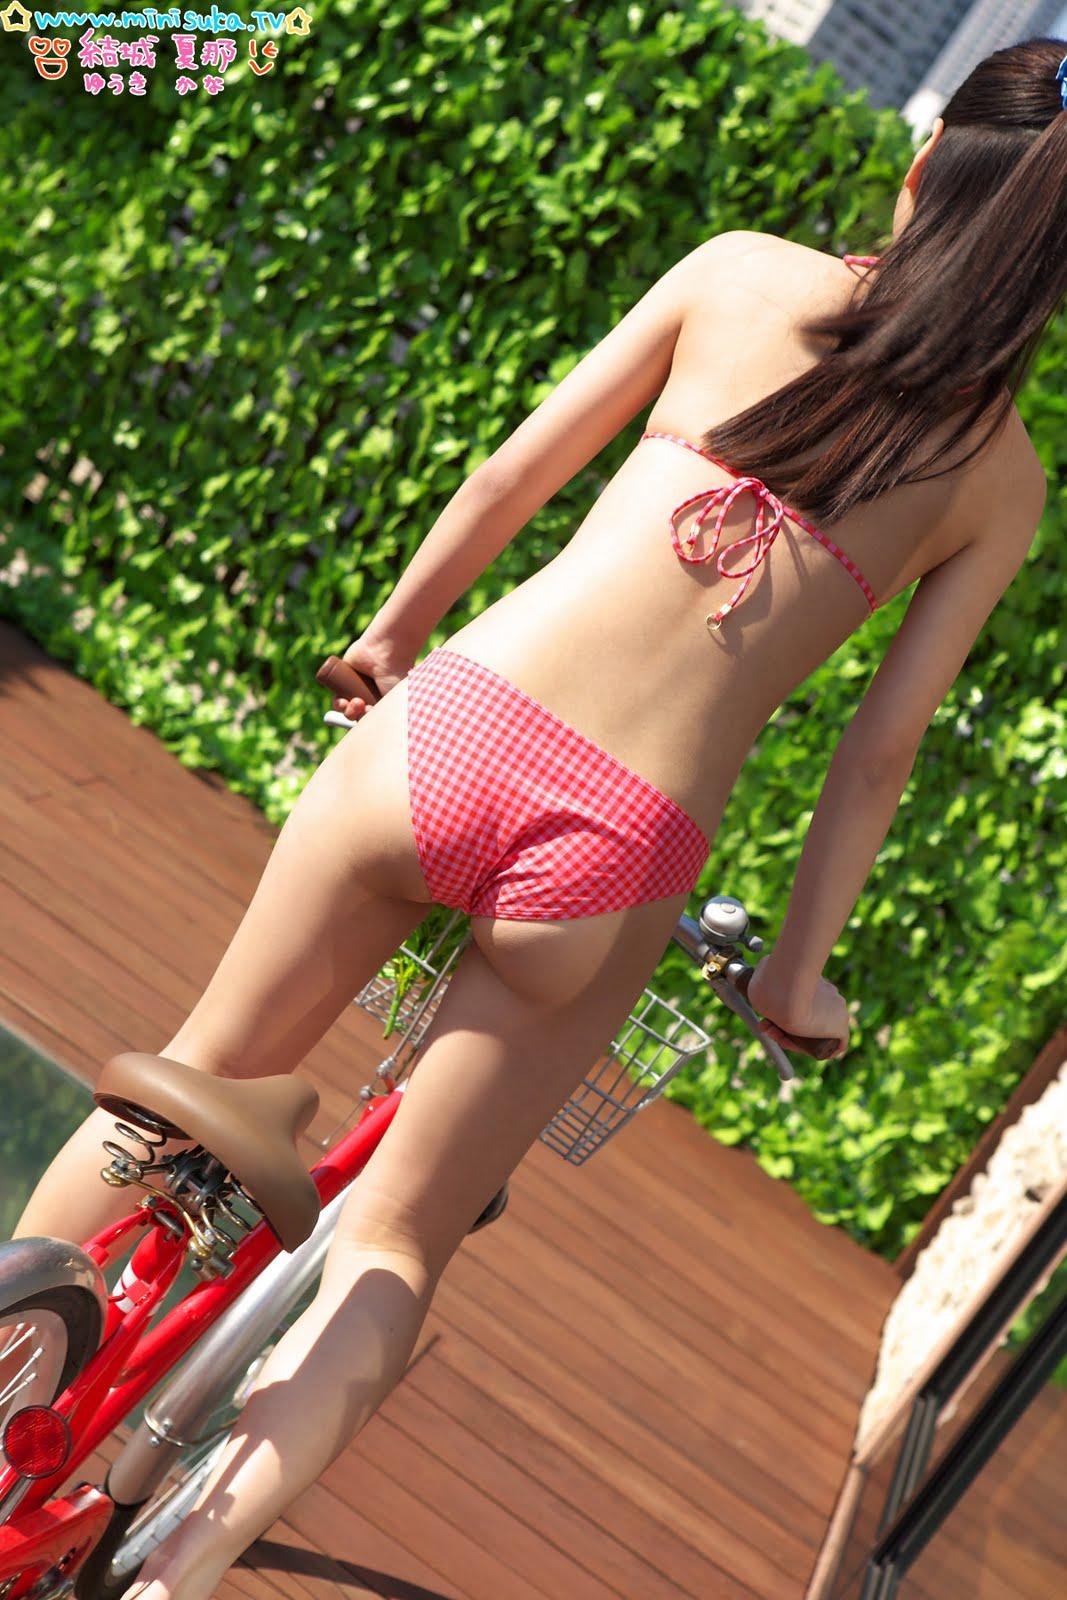 2 hot girls 511 - 1 1